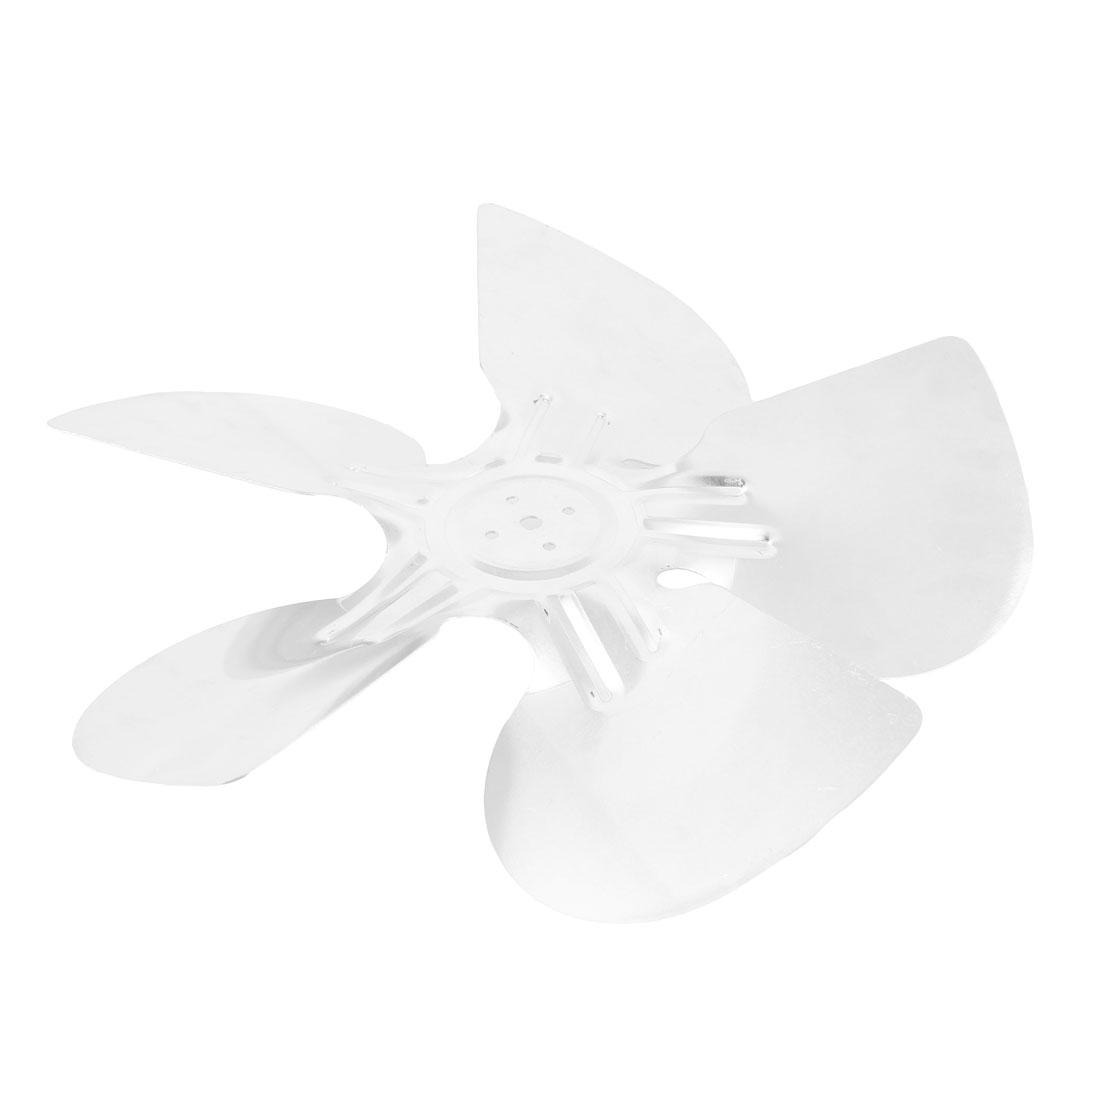 "Home Plant Restaurant Kitchen Silver Tone Aluminum Alloy Refrigertor Ventilator Exaust Motor Fan Vanes Silver Tone 30cm 11.8"" Diameter"